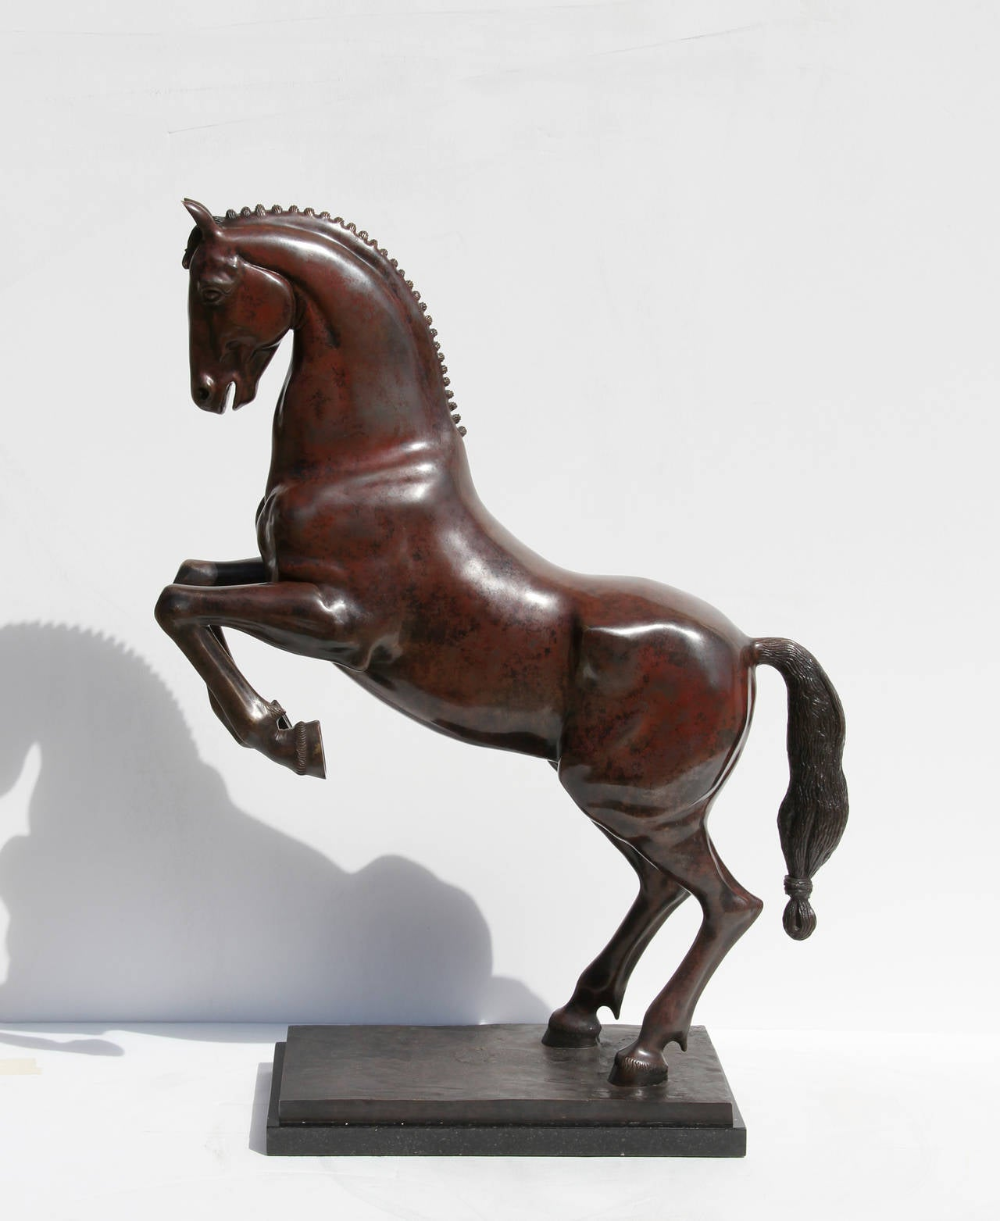 Aga Ousseinov - Horse, Bronze Sculpture For Sale at 1stdibs